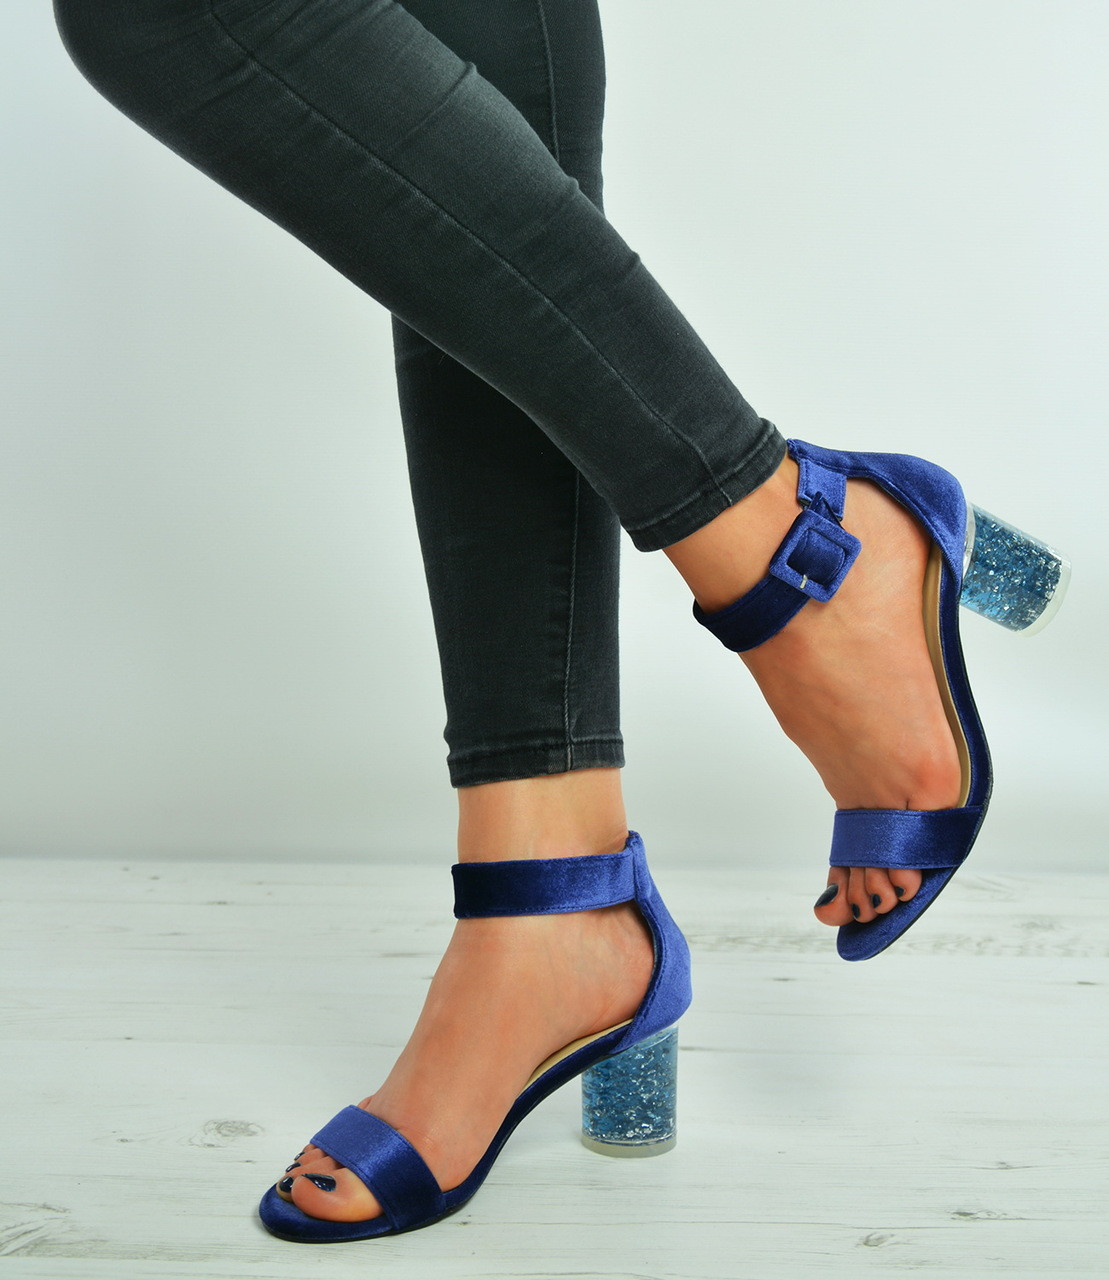 9e5f7e98a85 Blue Velvet Ankle Strap Perspex Stylish Heel Sandals Shoes Size Uk 3-8